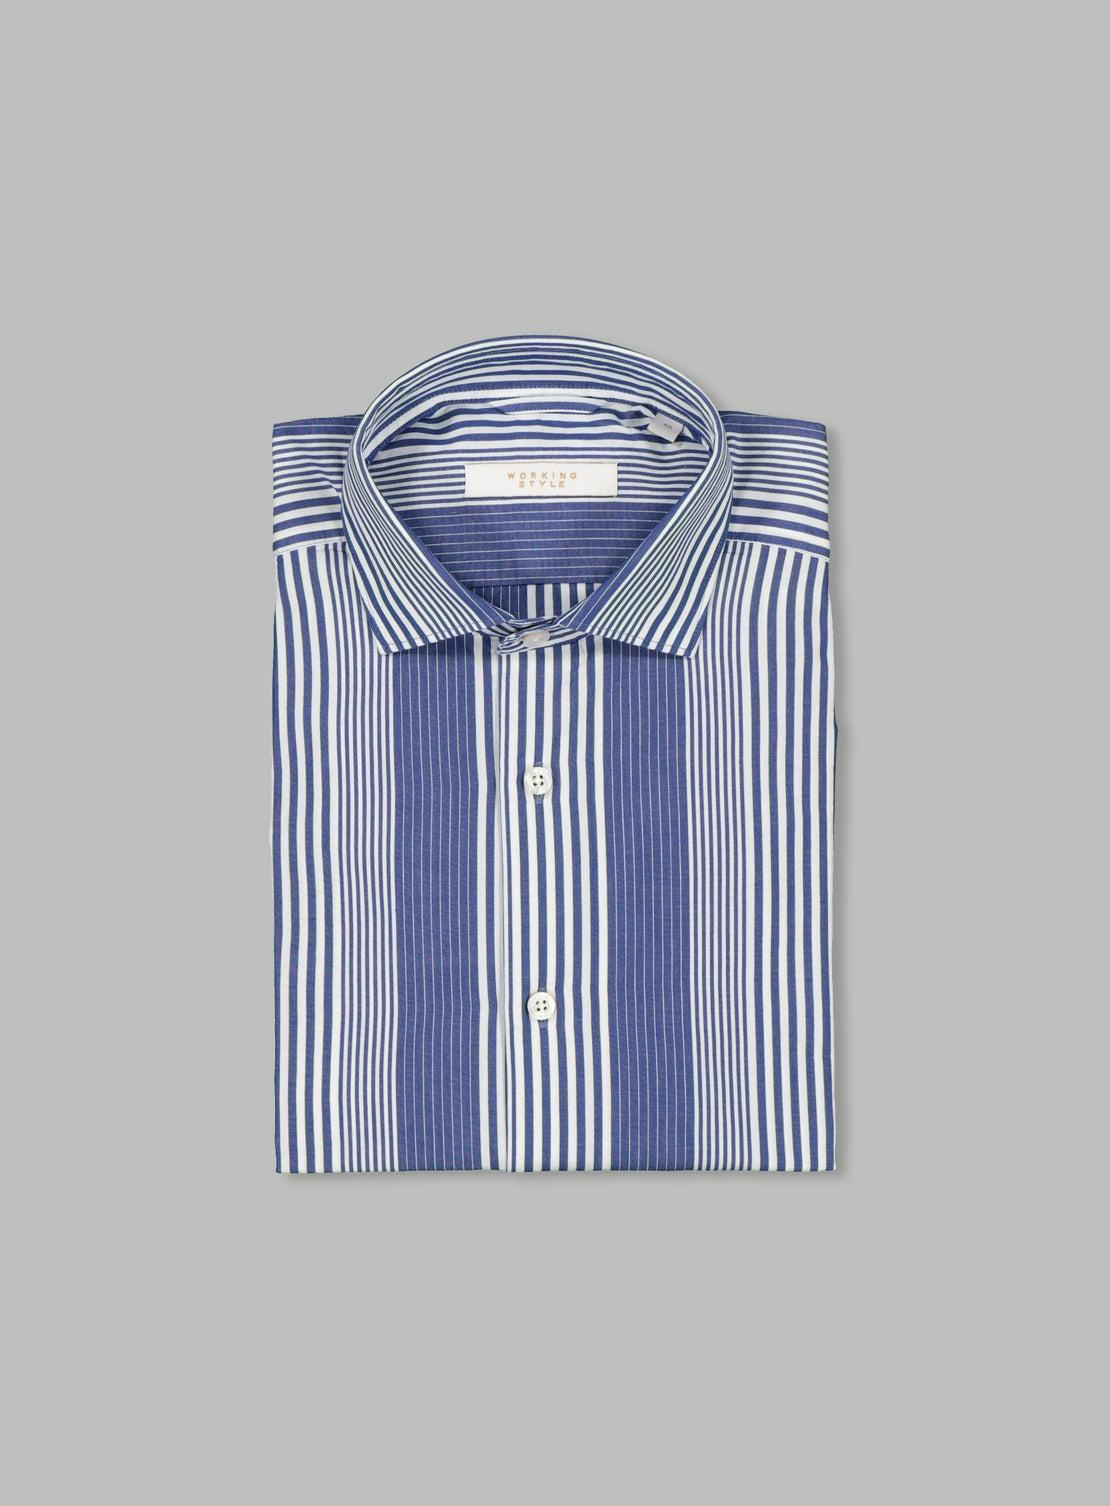 Variegated Stripe Shirt